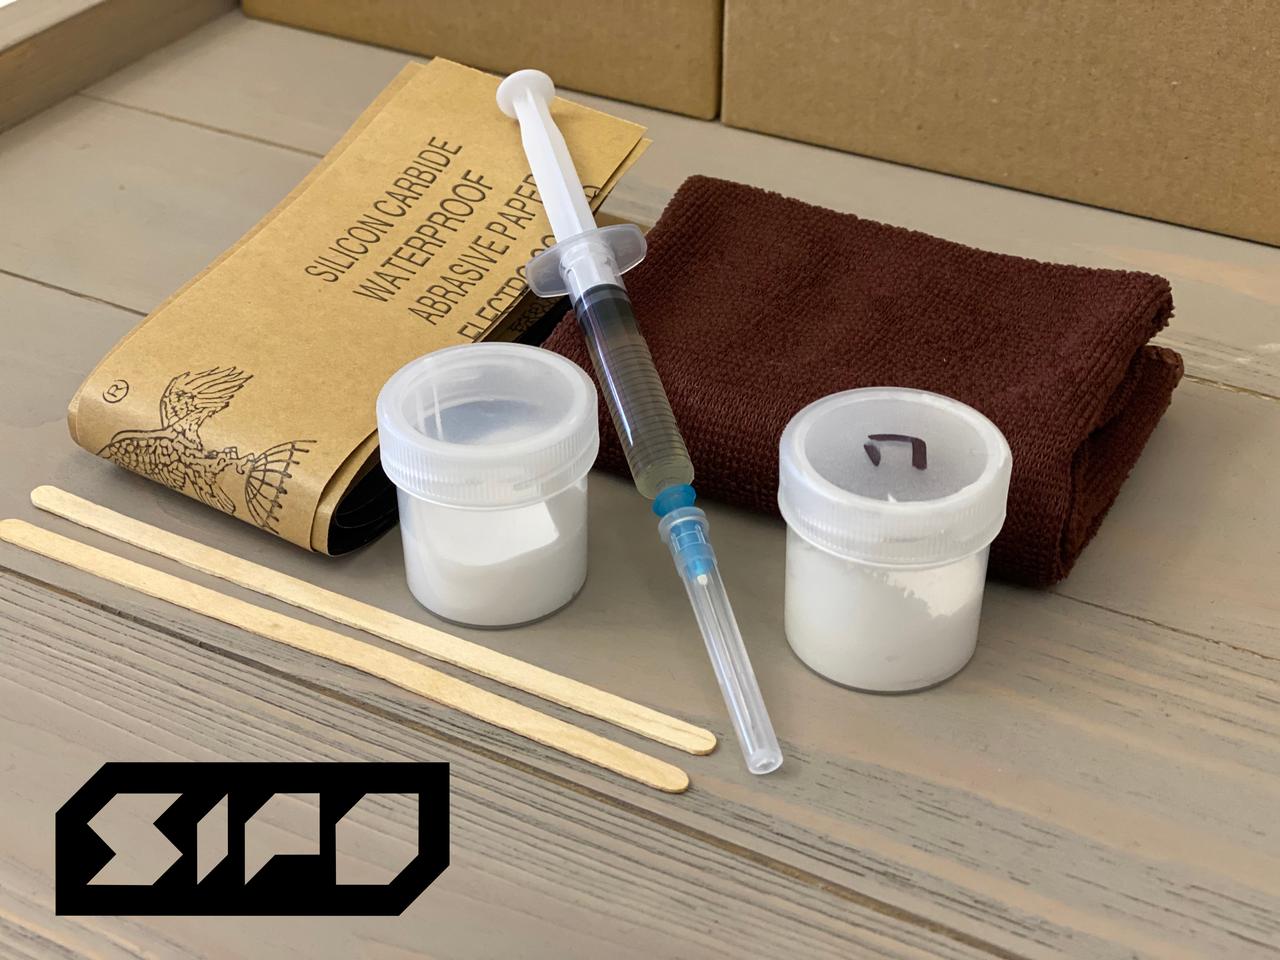 Ремкомплект для ванн Sipo - для ремонта царапин, сколов и трещин 7trav